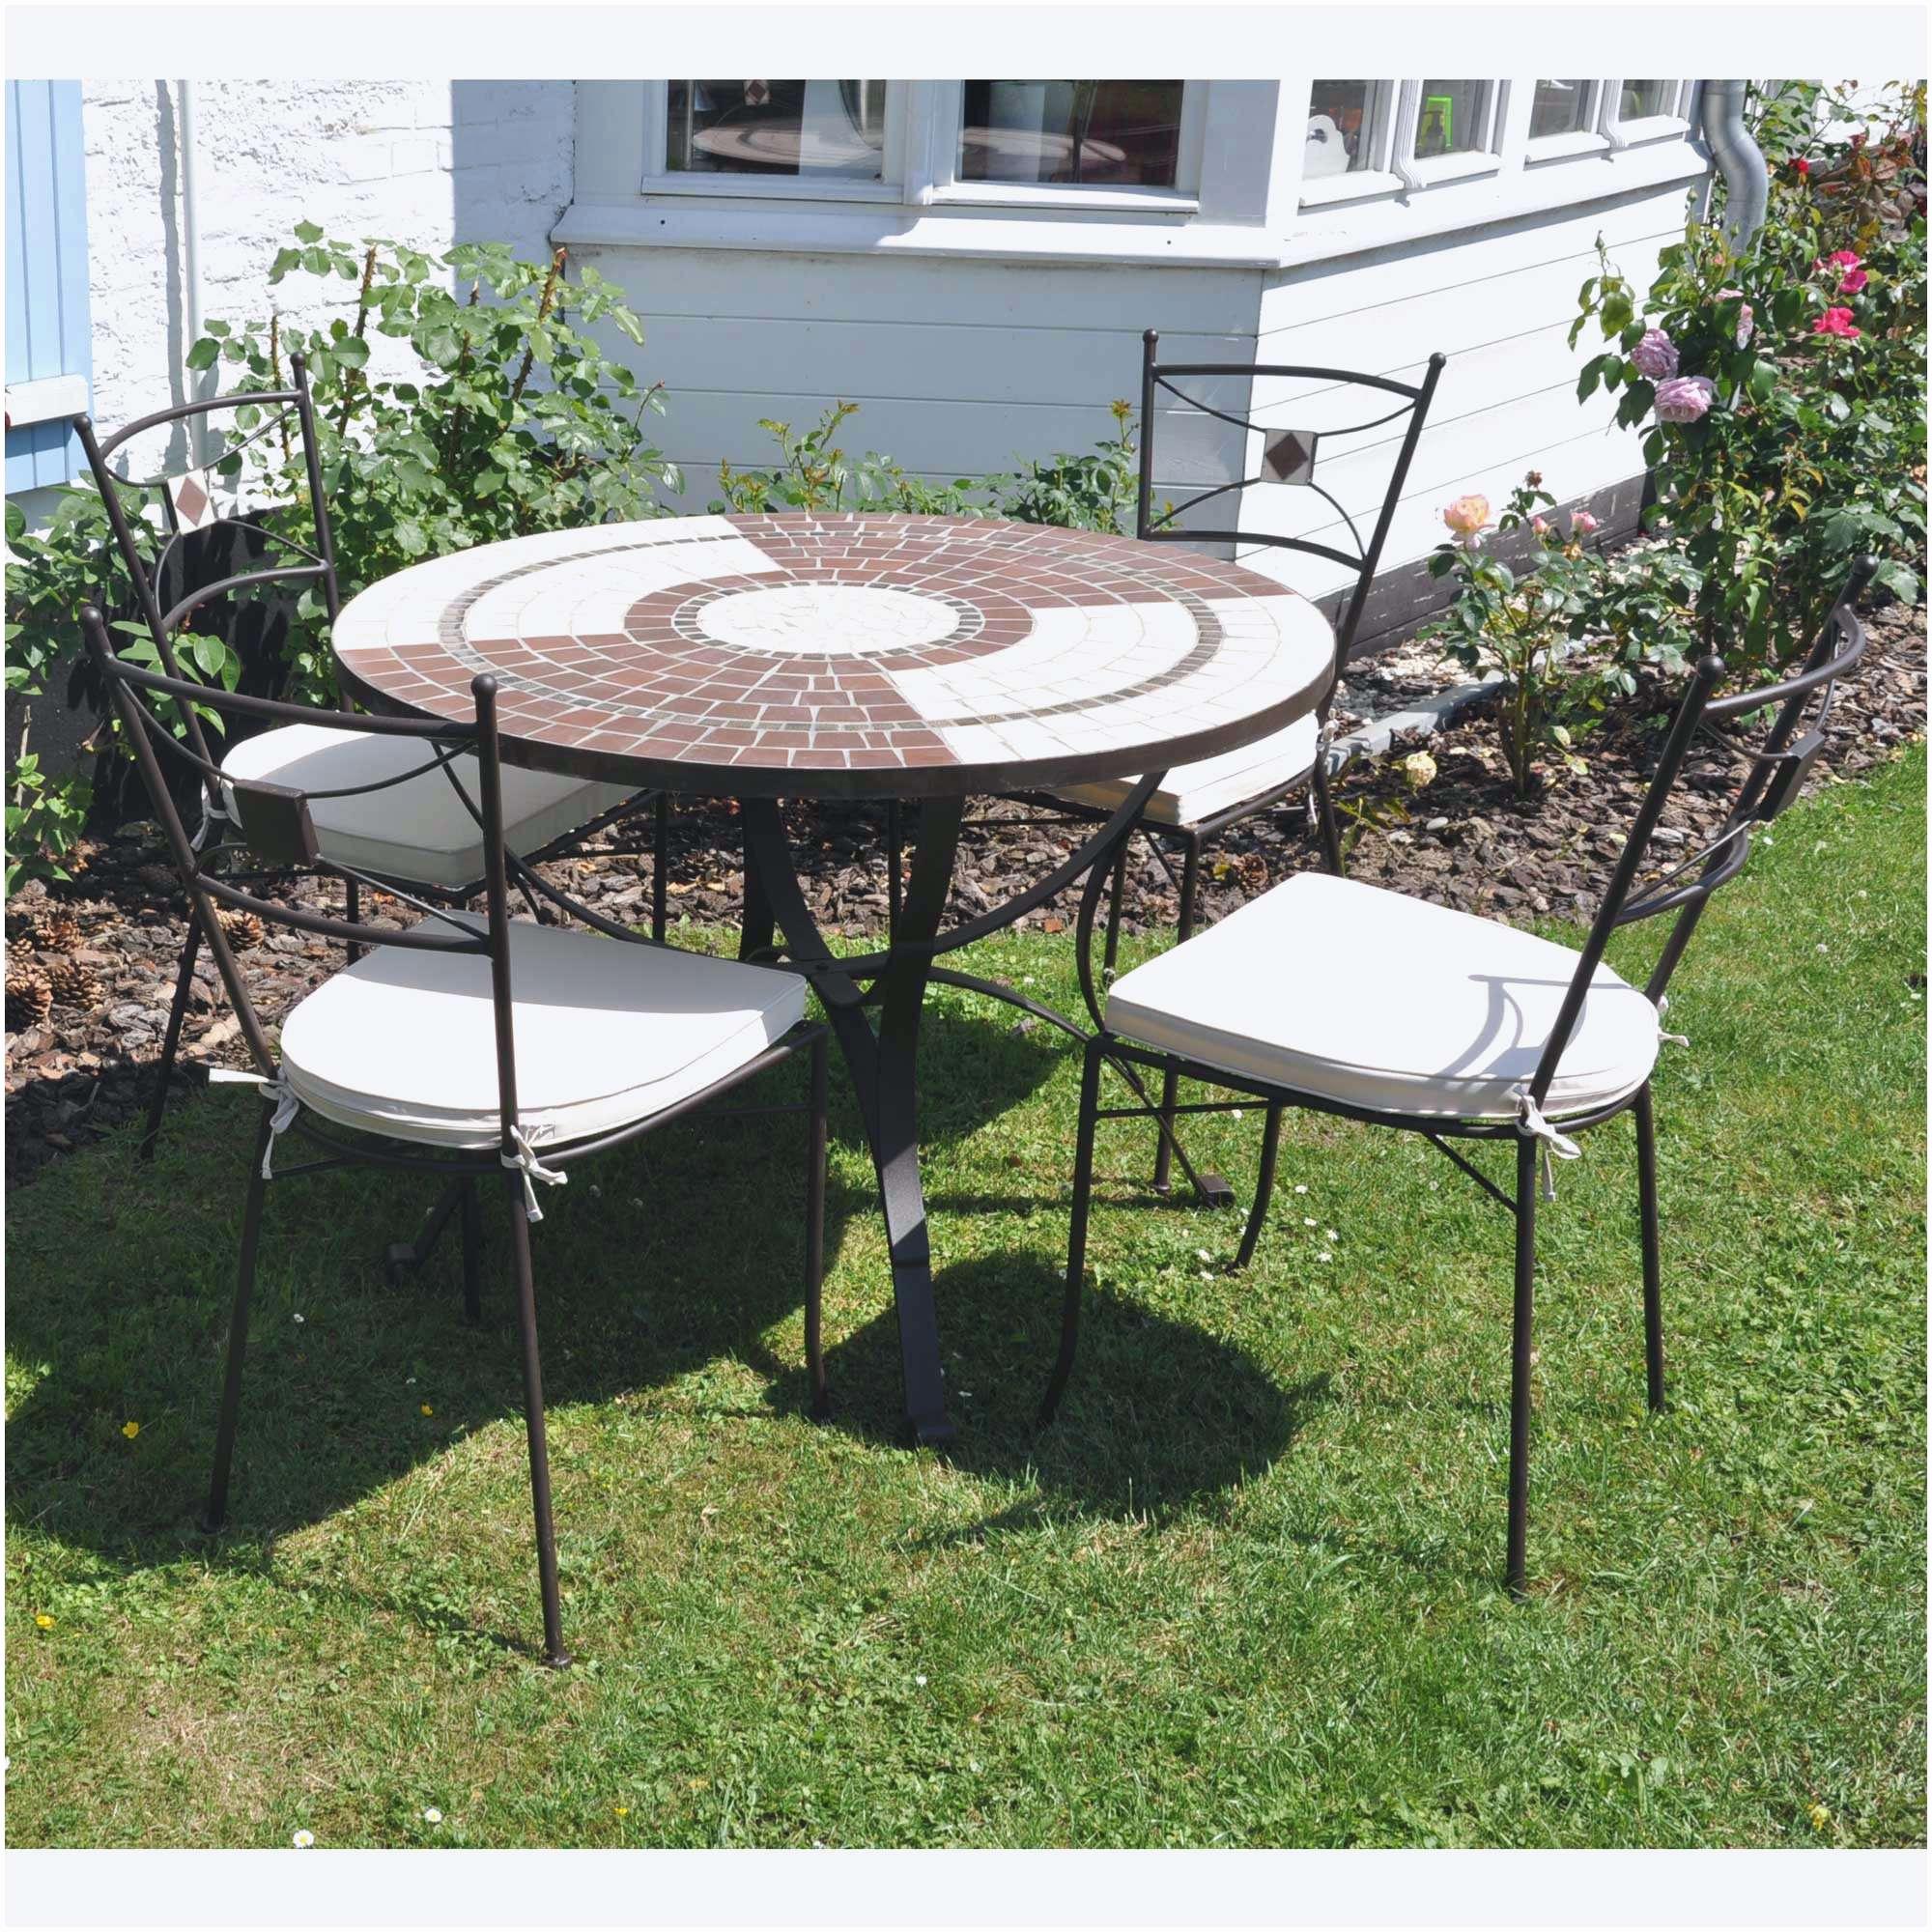 Table De Jardin Brico Depot - Canalcncarauca destiné Table De Jardin Brico